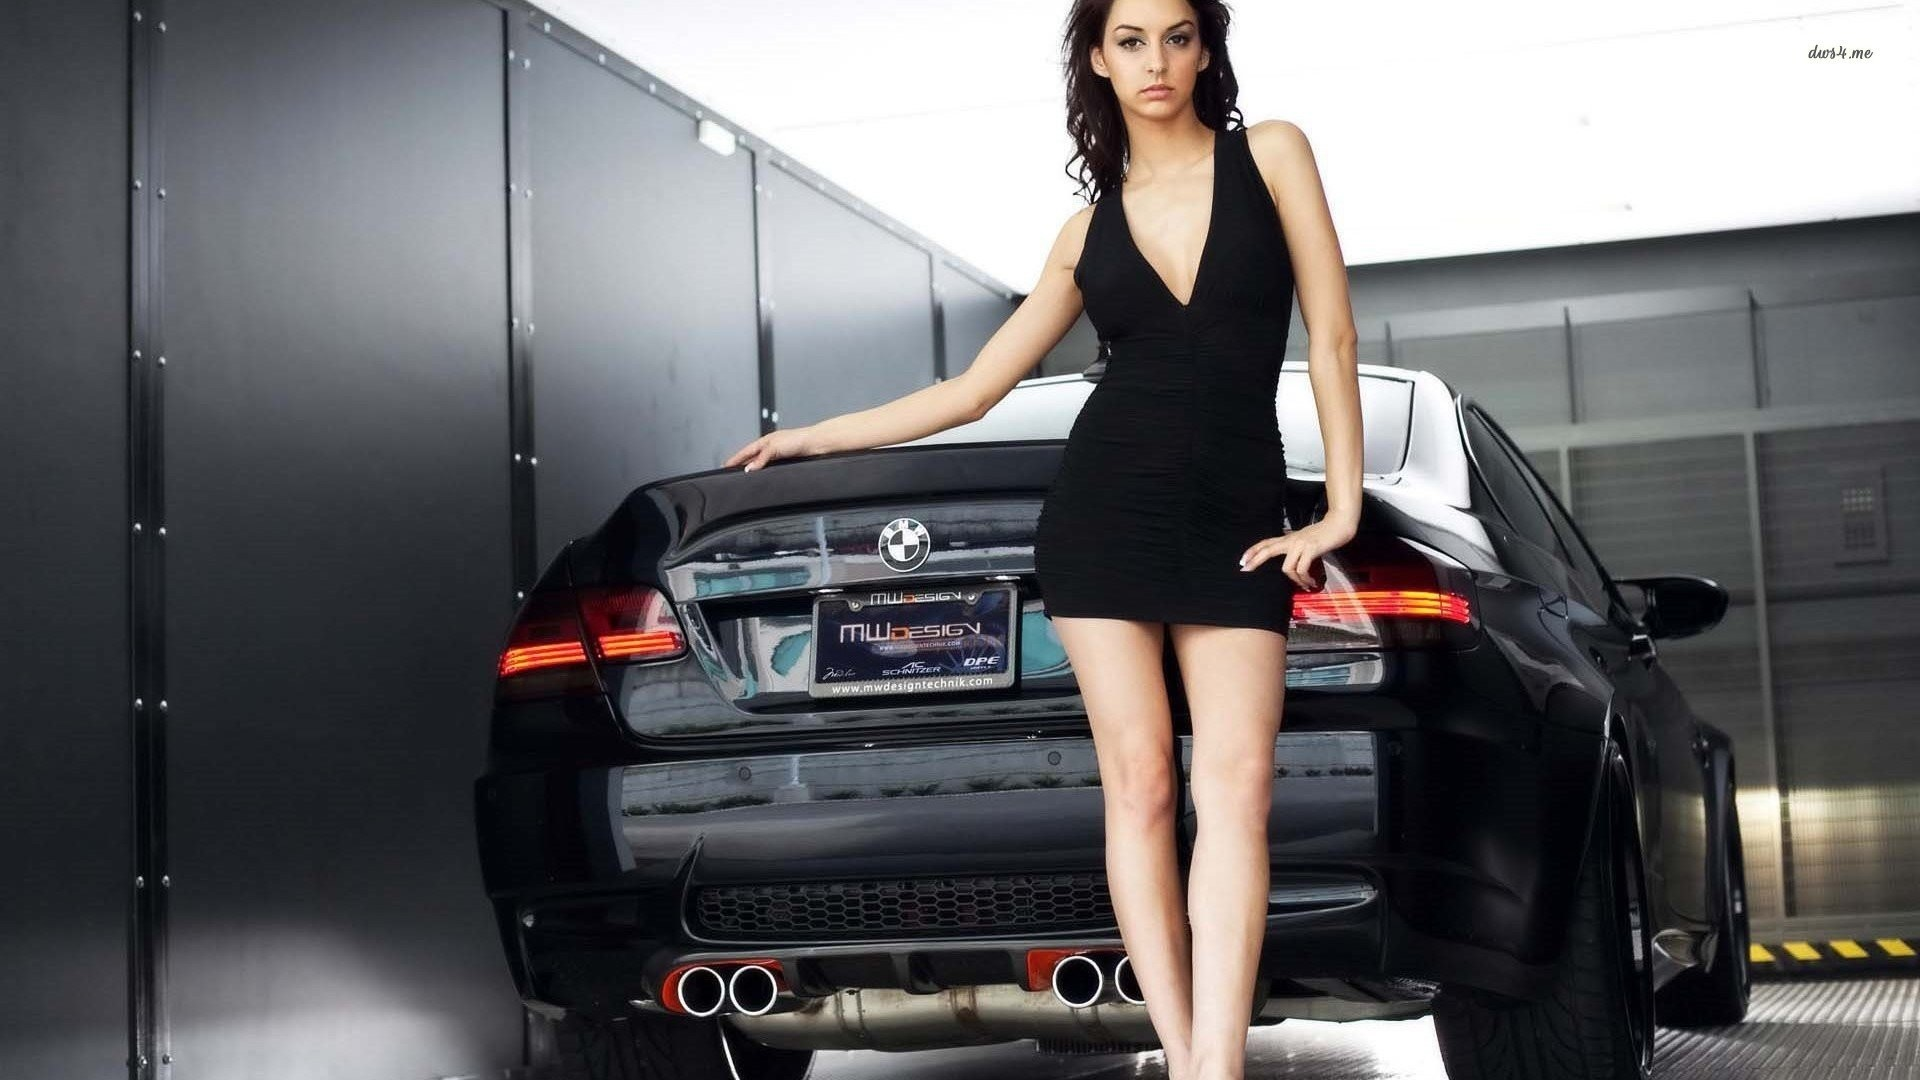 Girl And BMW M3 Darth Maul 557626